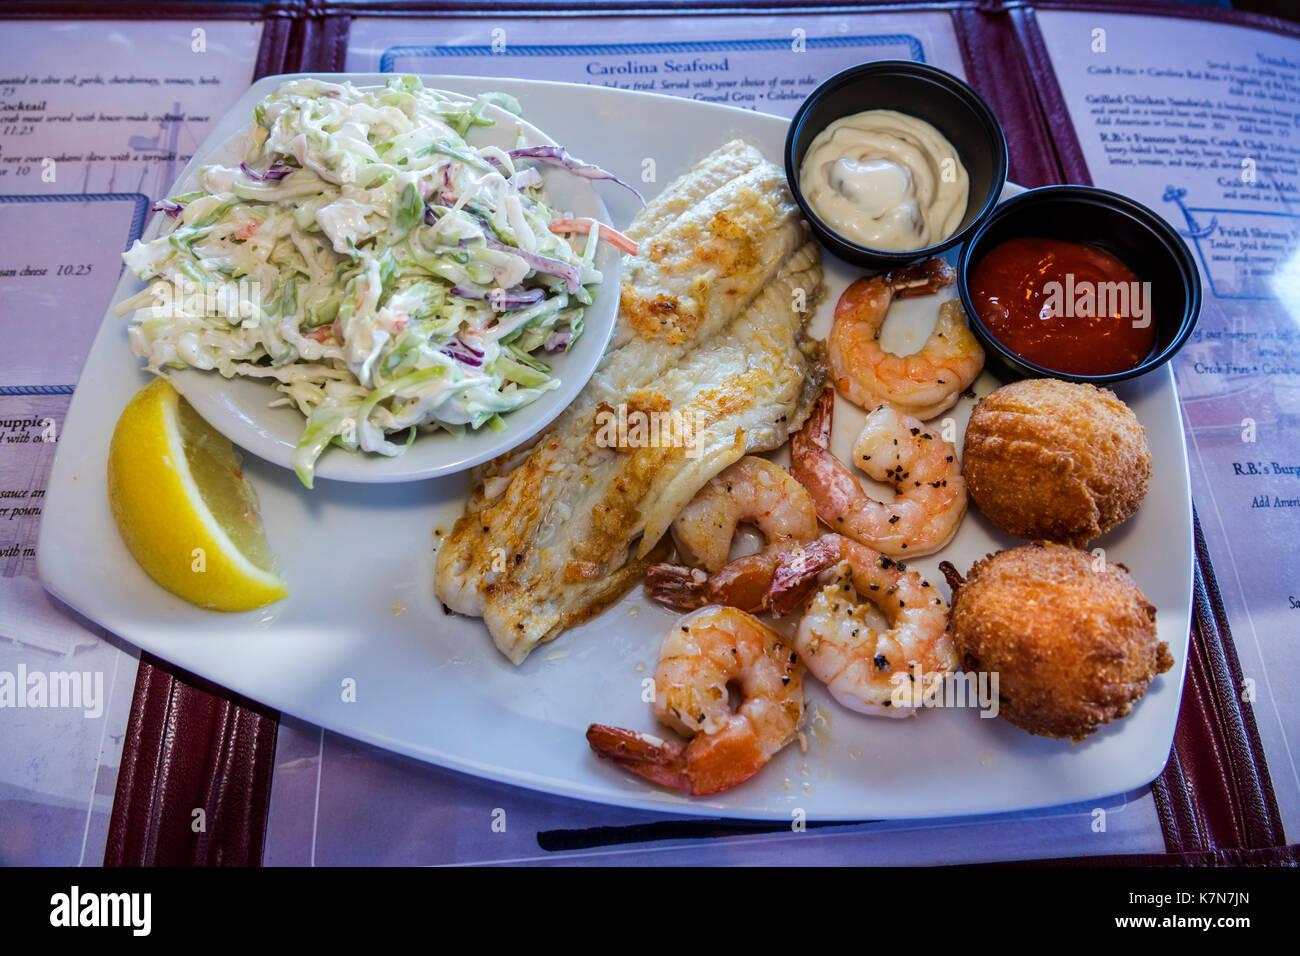 South Carolina SC Mt. Pleasant Shem Creek waterfront R.B.'s Seafood Restaurant dining plate shrimp fish filet - Stock Image